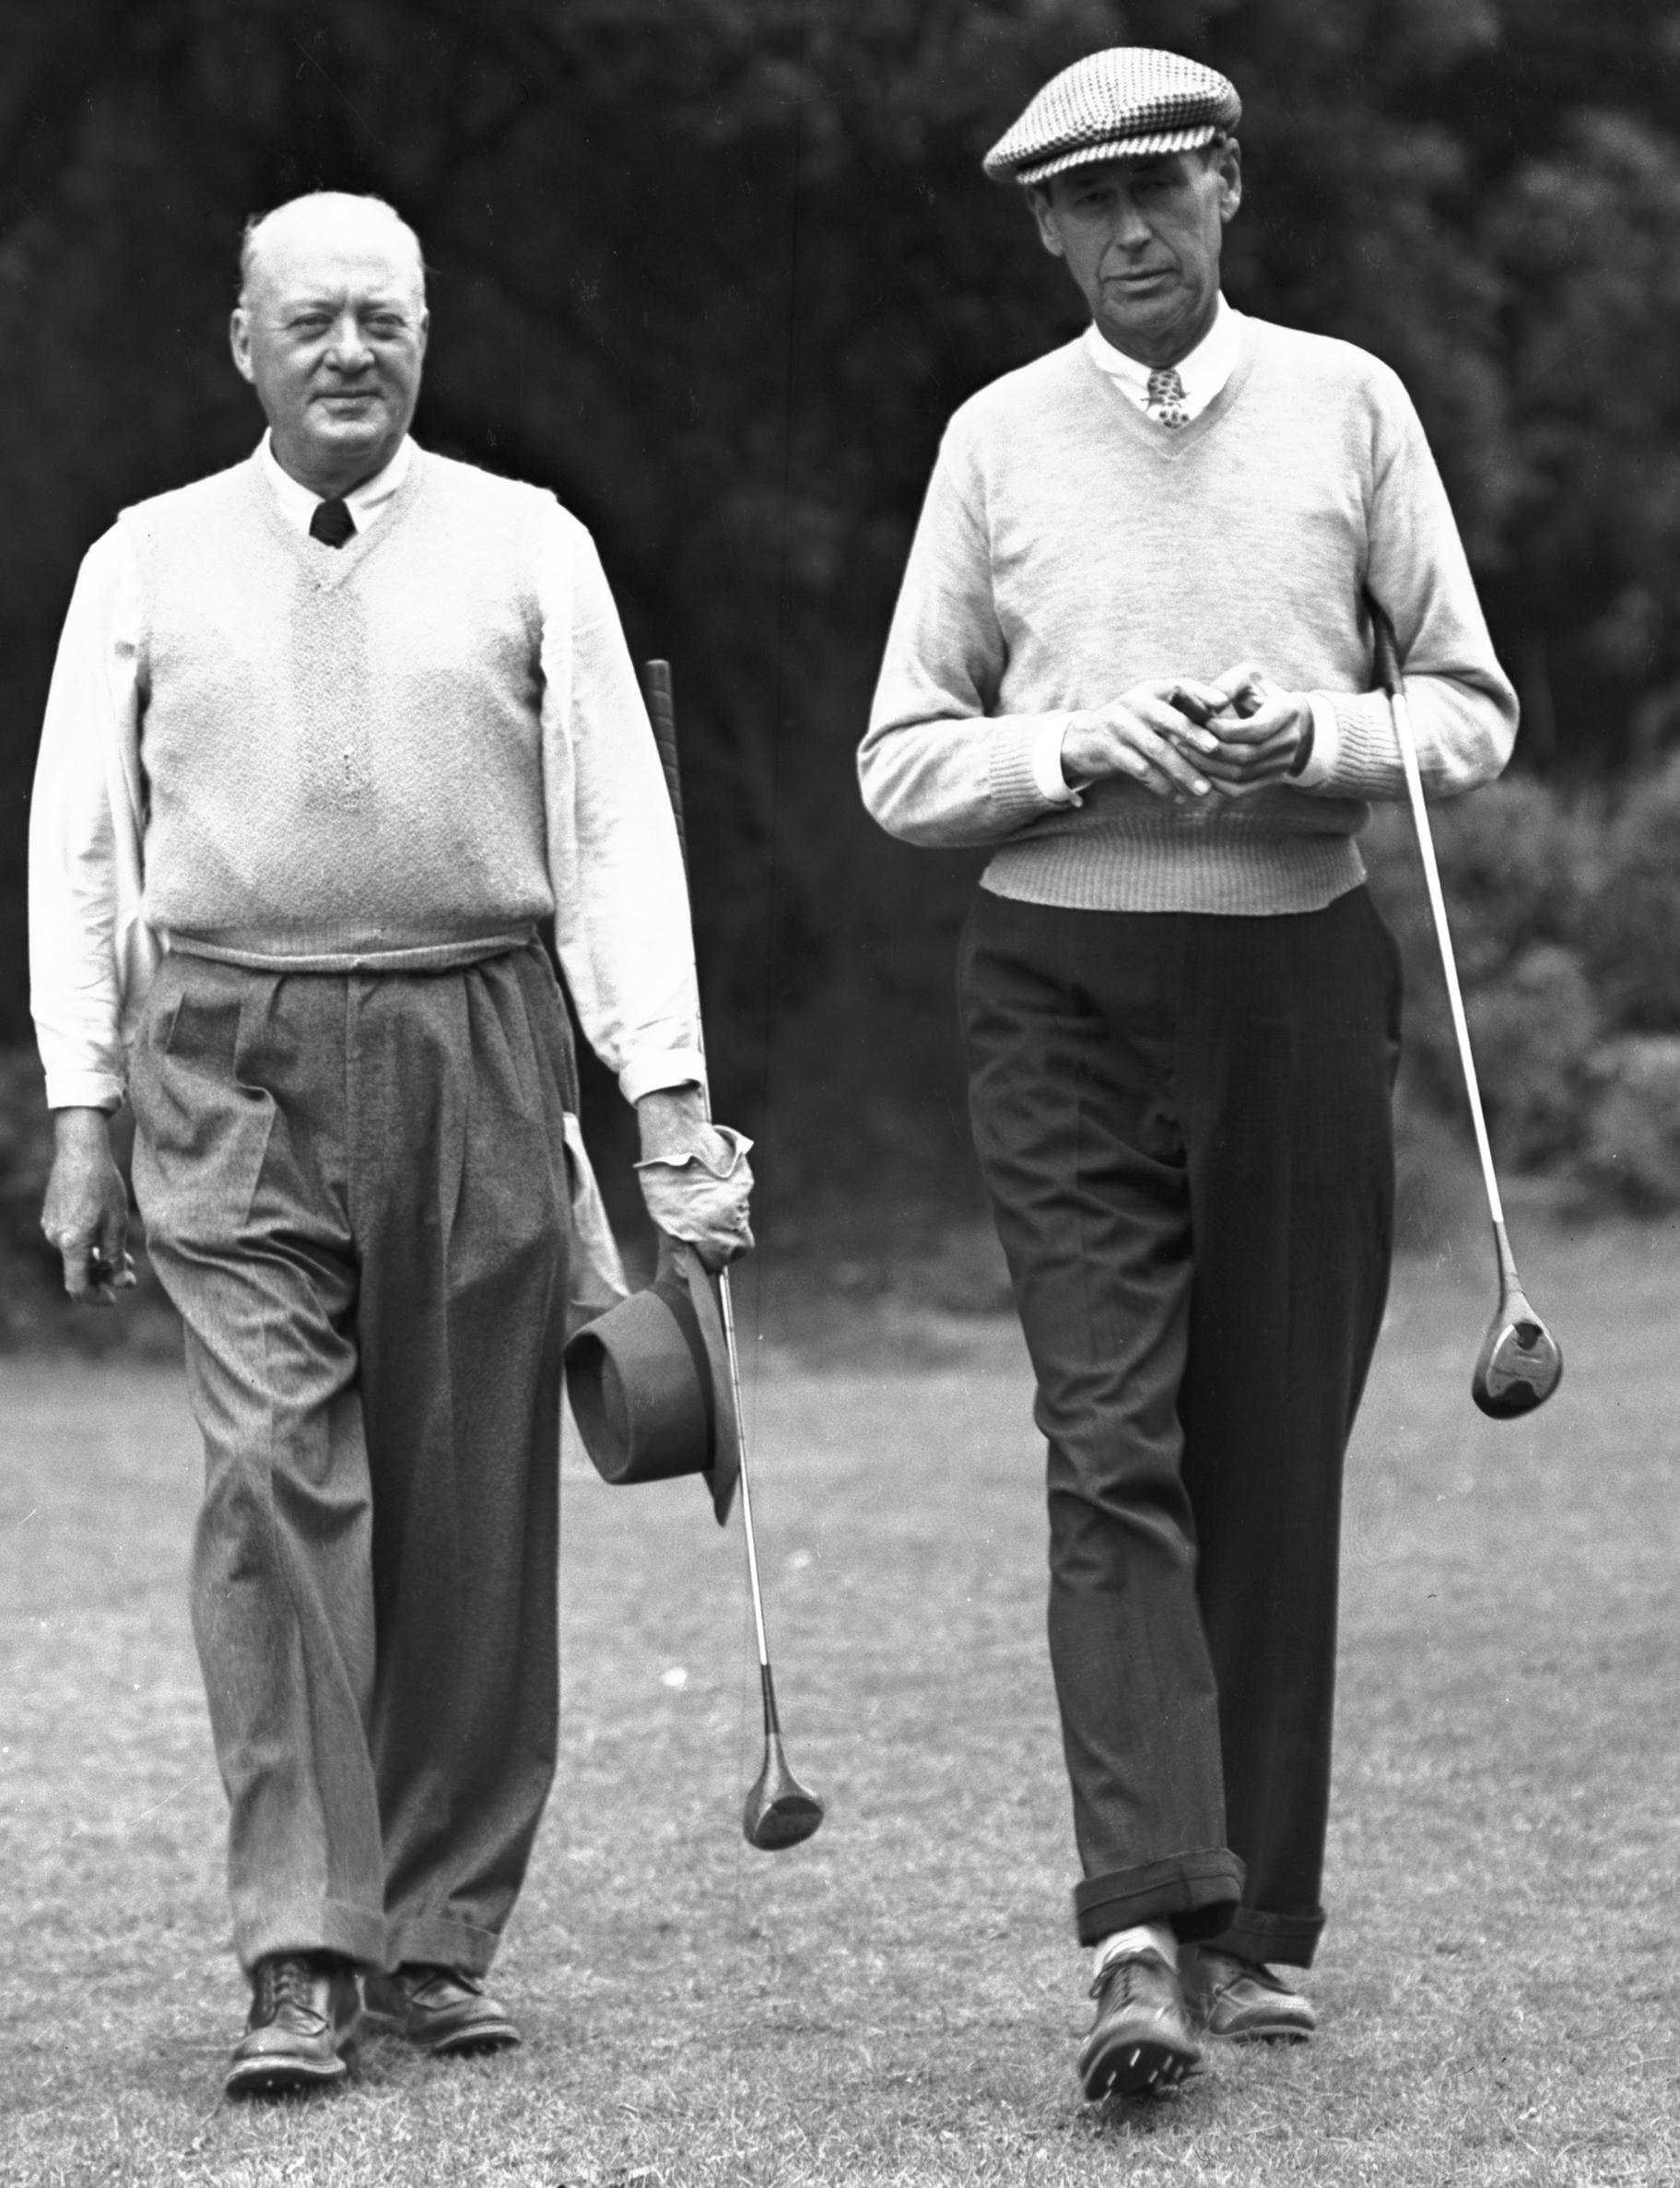 Jack Neville and Douglas Grant